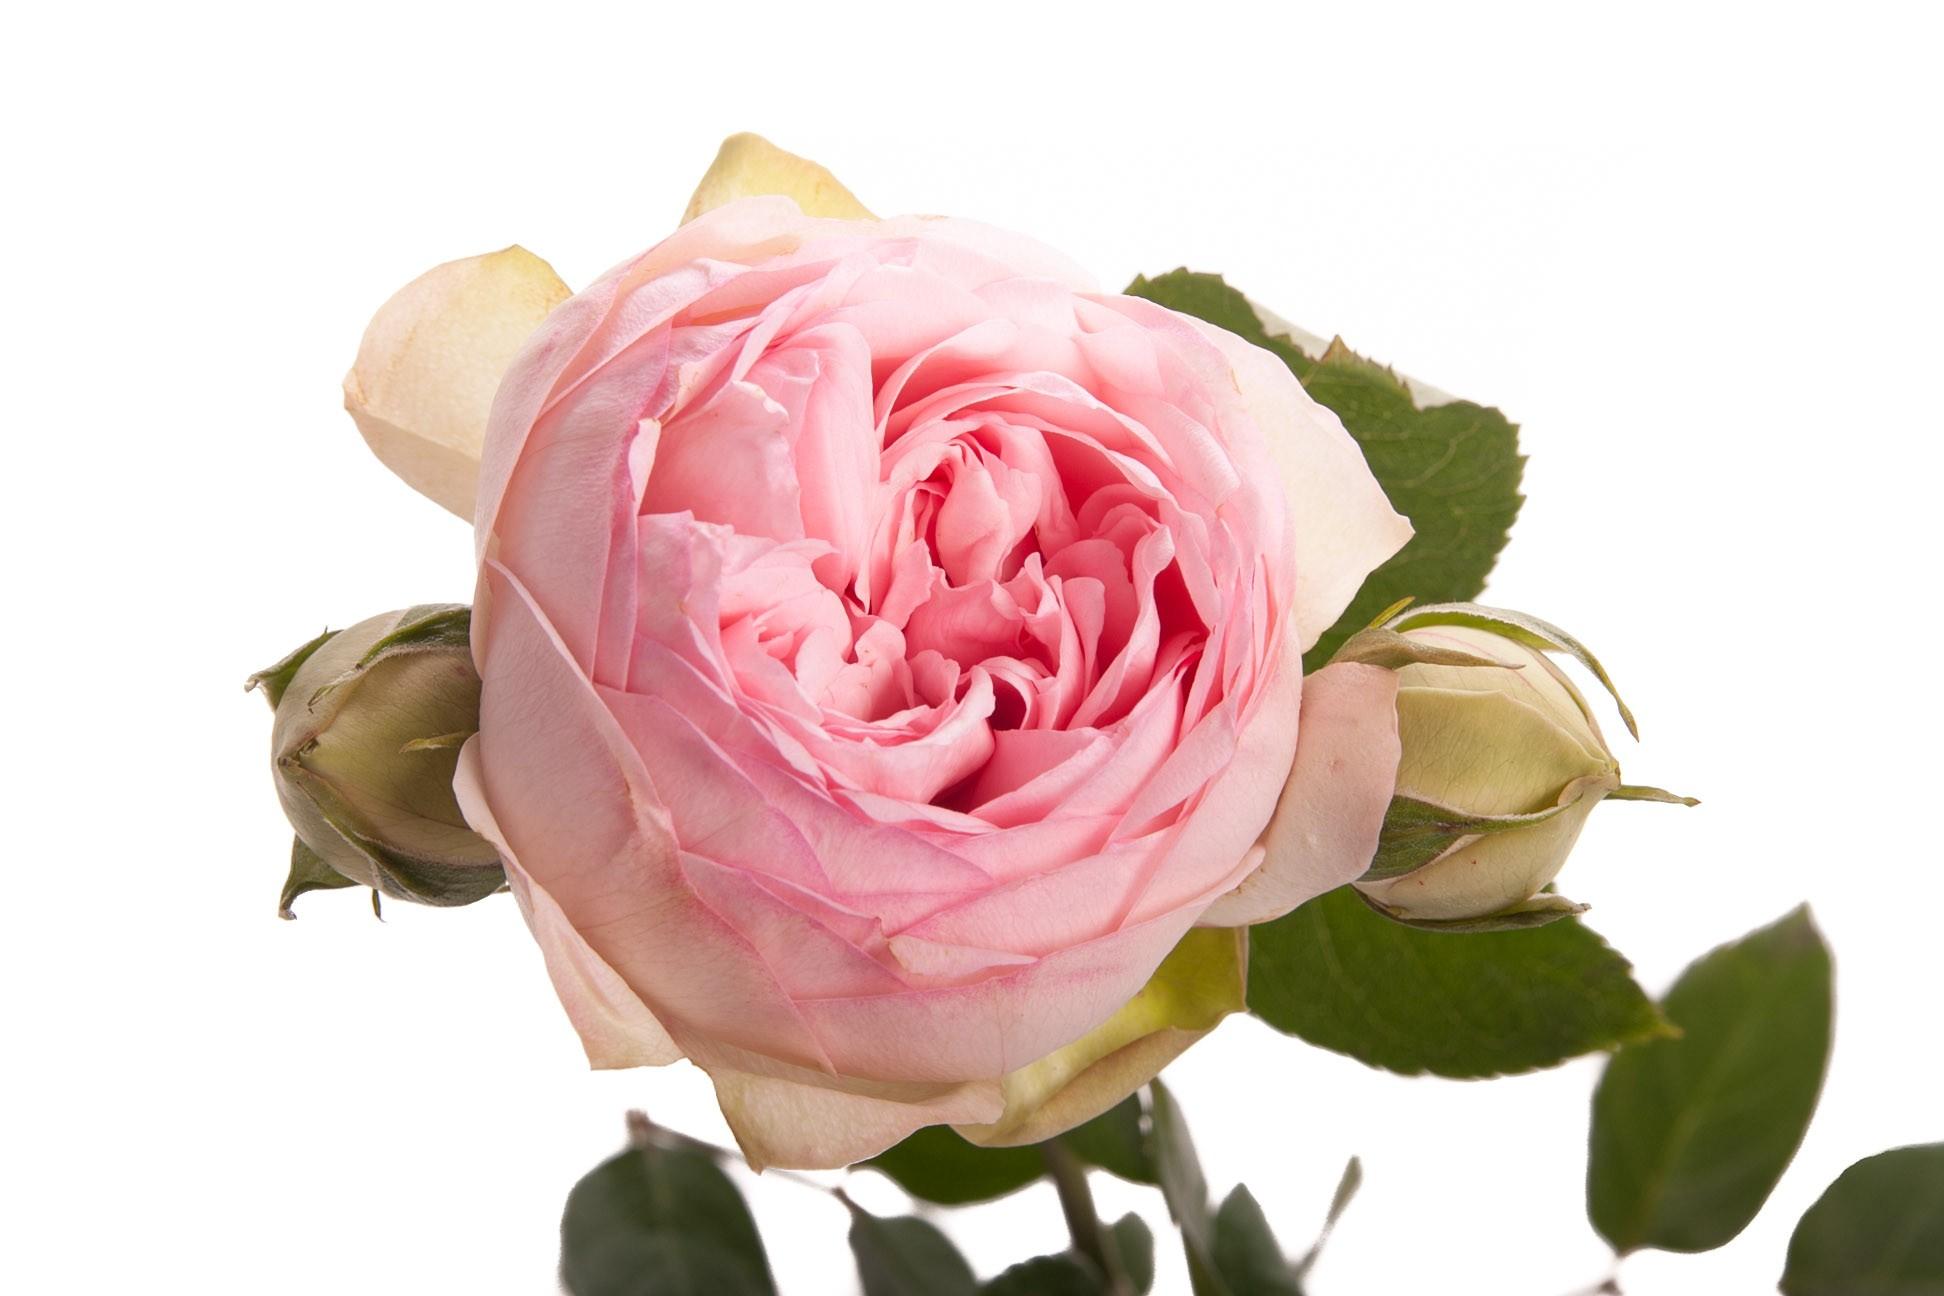 Rosa Garden Bridal Piano (Роза Гарден Бридал пиано) В60